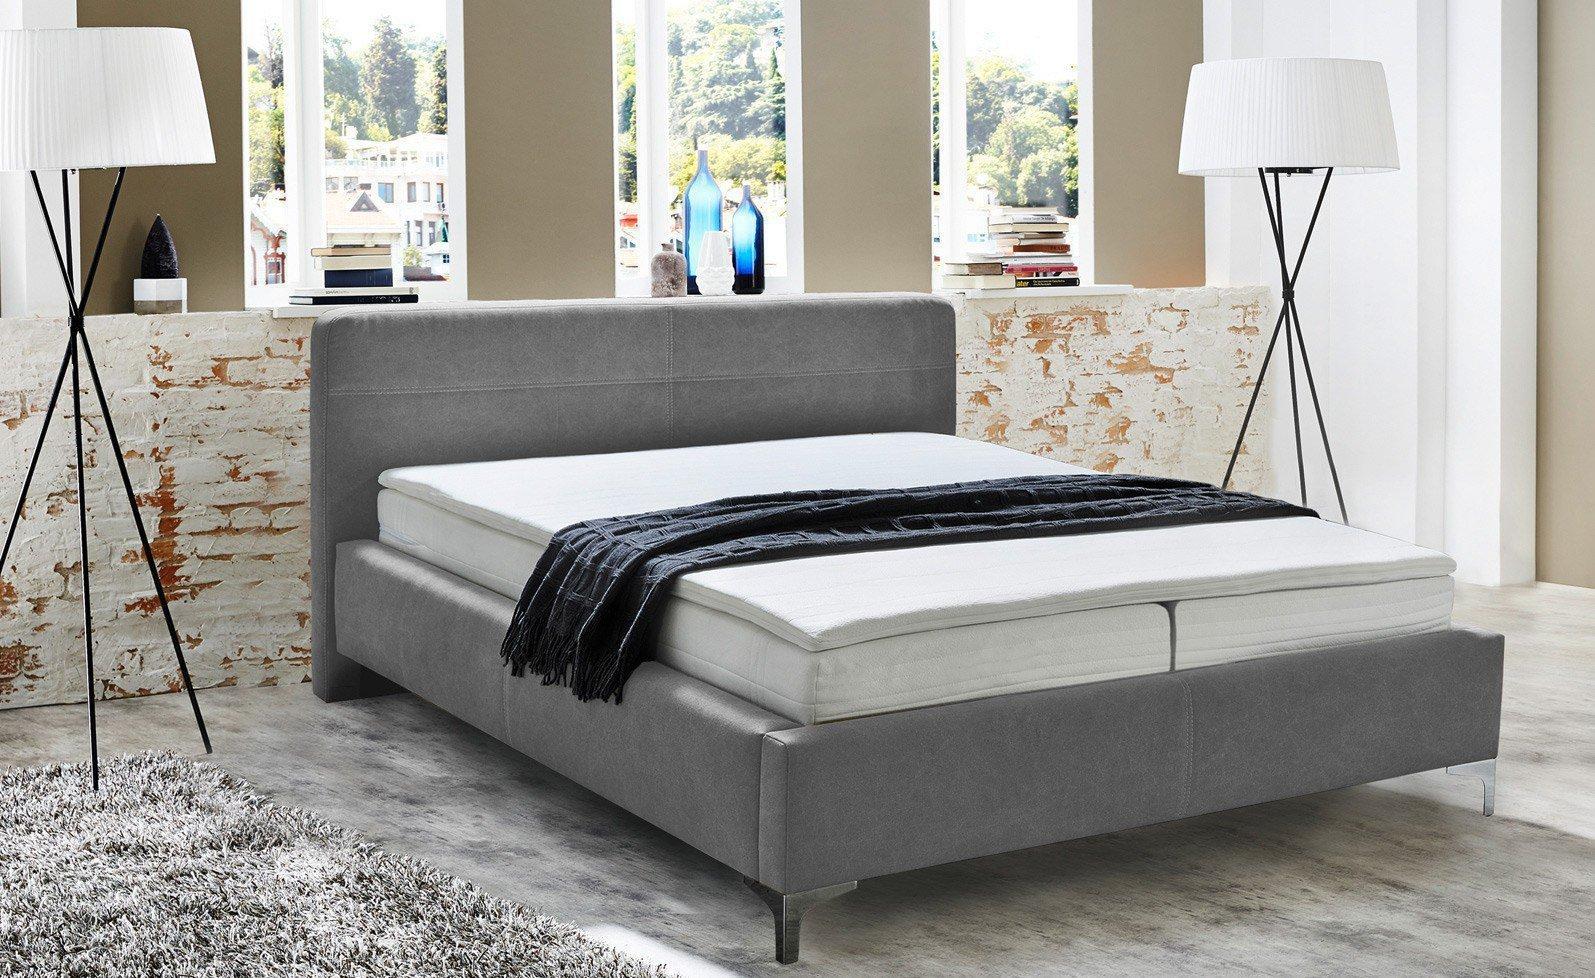 jockenh fer matera darryl boxspringbett mit stoffbezogenem bettgestell m bel letz ihr. Black Bedroom Furniture Sets. Home Design Ideas